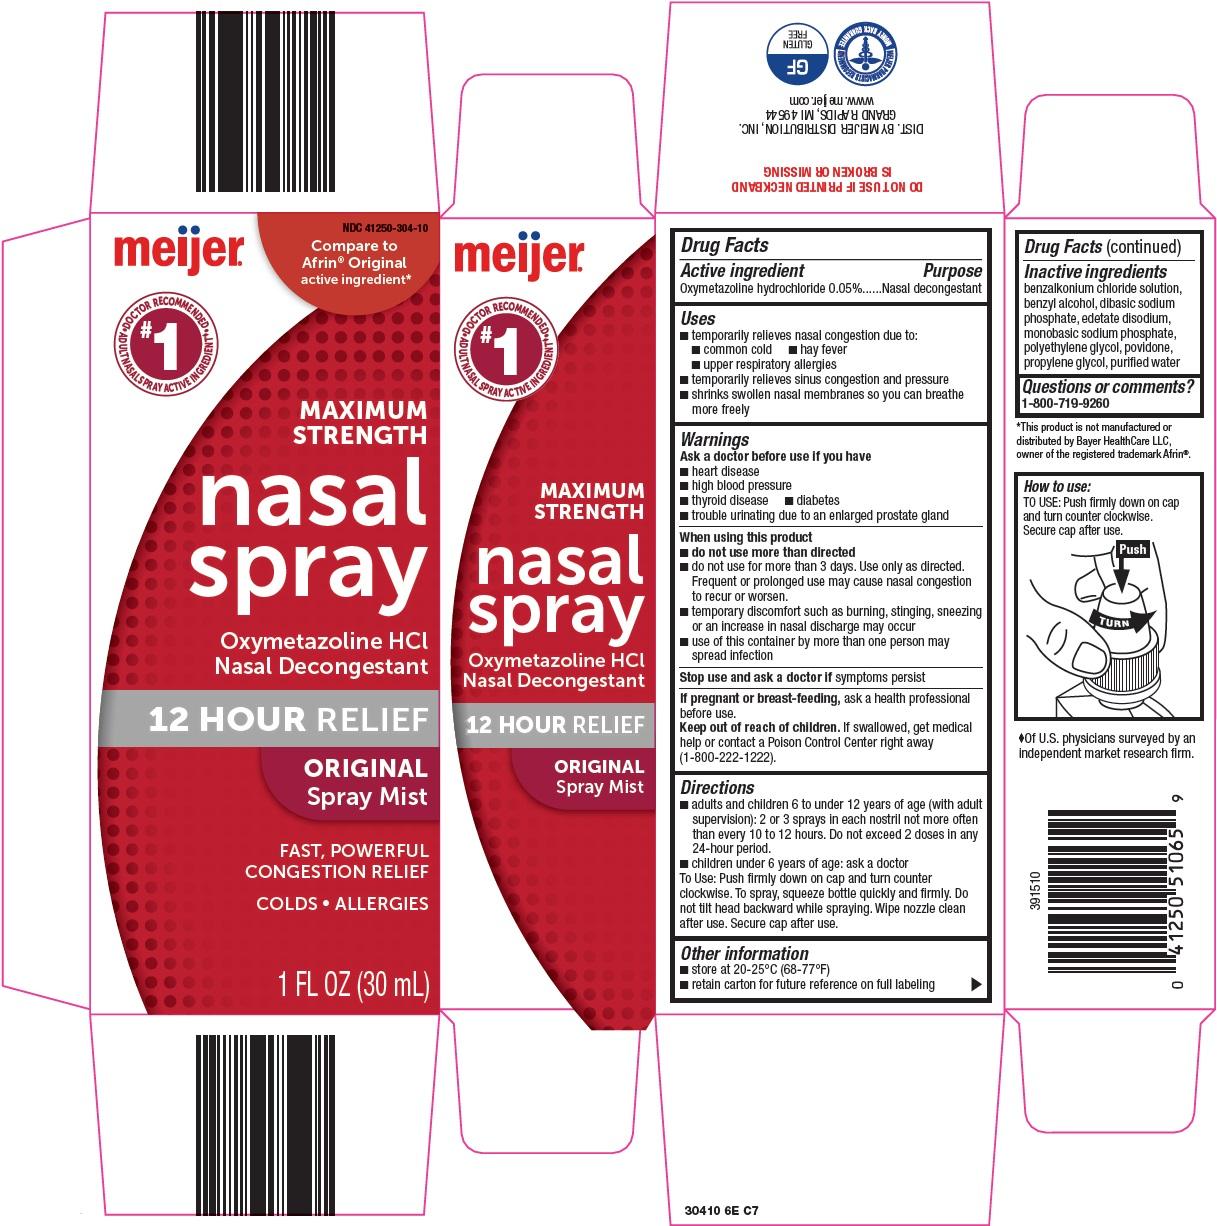 304-6e-nasal-spray.jpg